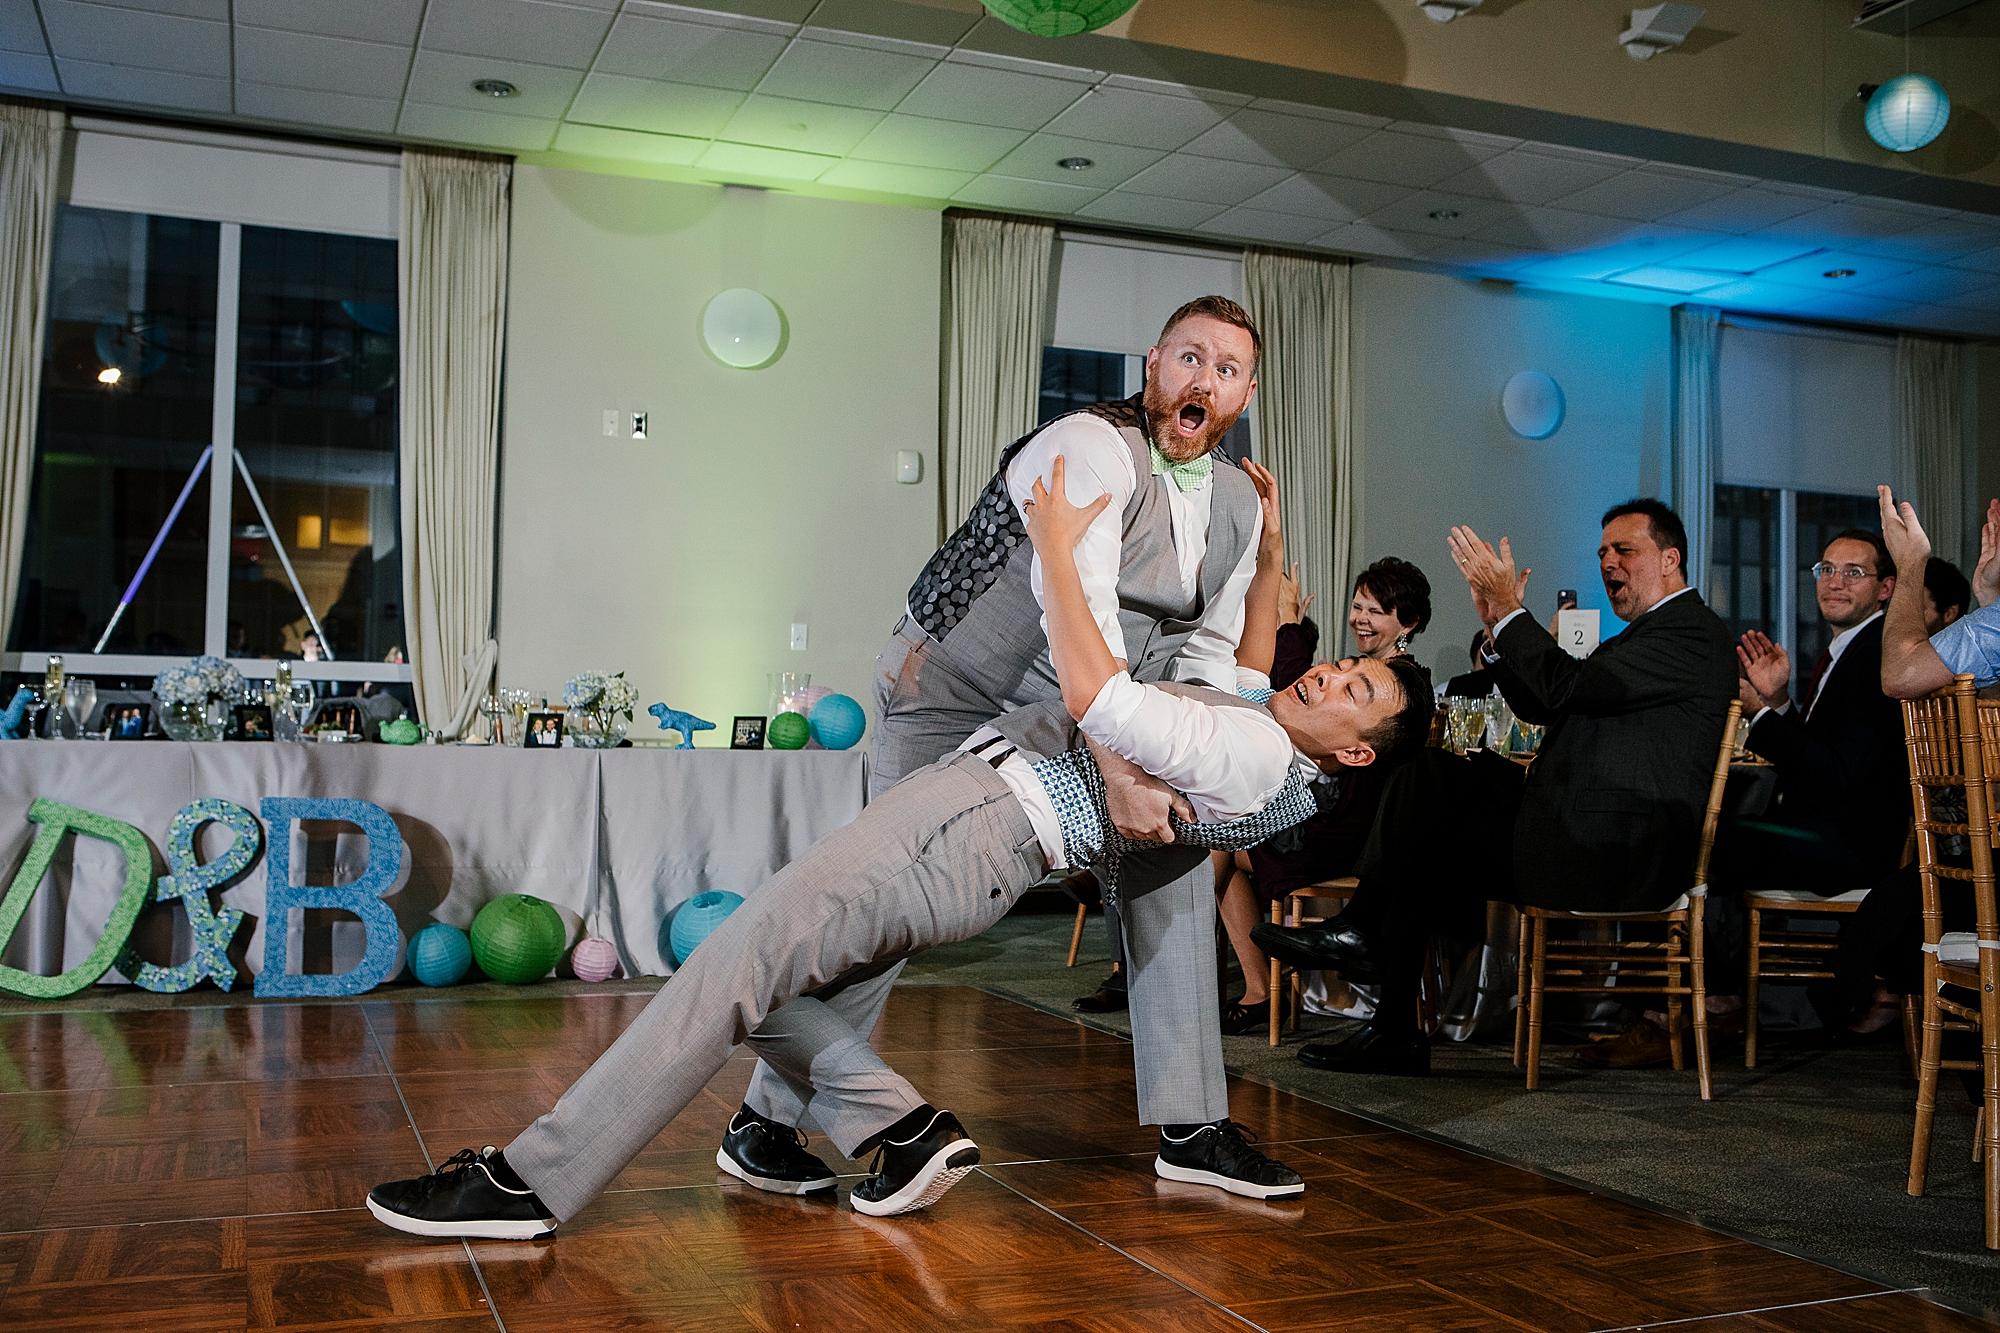 Dan_and_Byron_Love_by_Joe_Mac_Philadelphia_Wedding_LGBTQ_Photography_Gay_Independence_visitor_Center_128.JPG